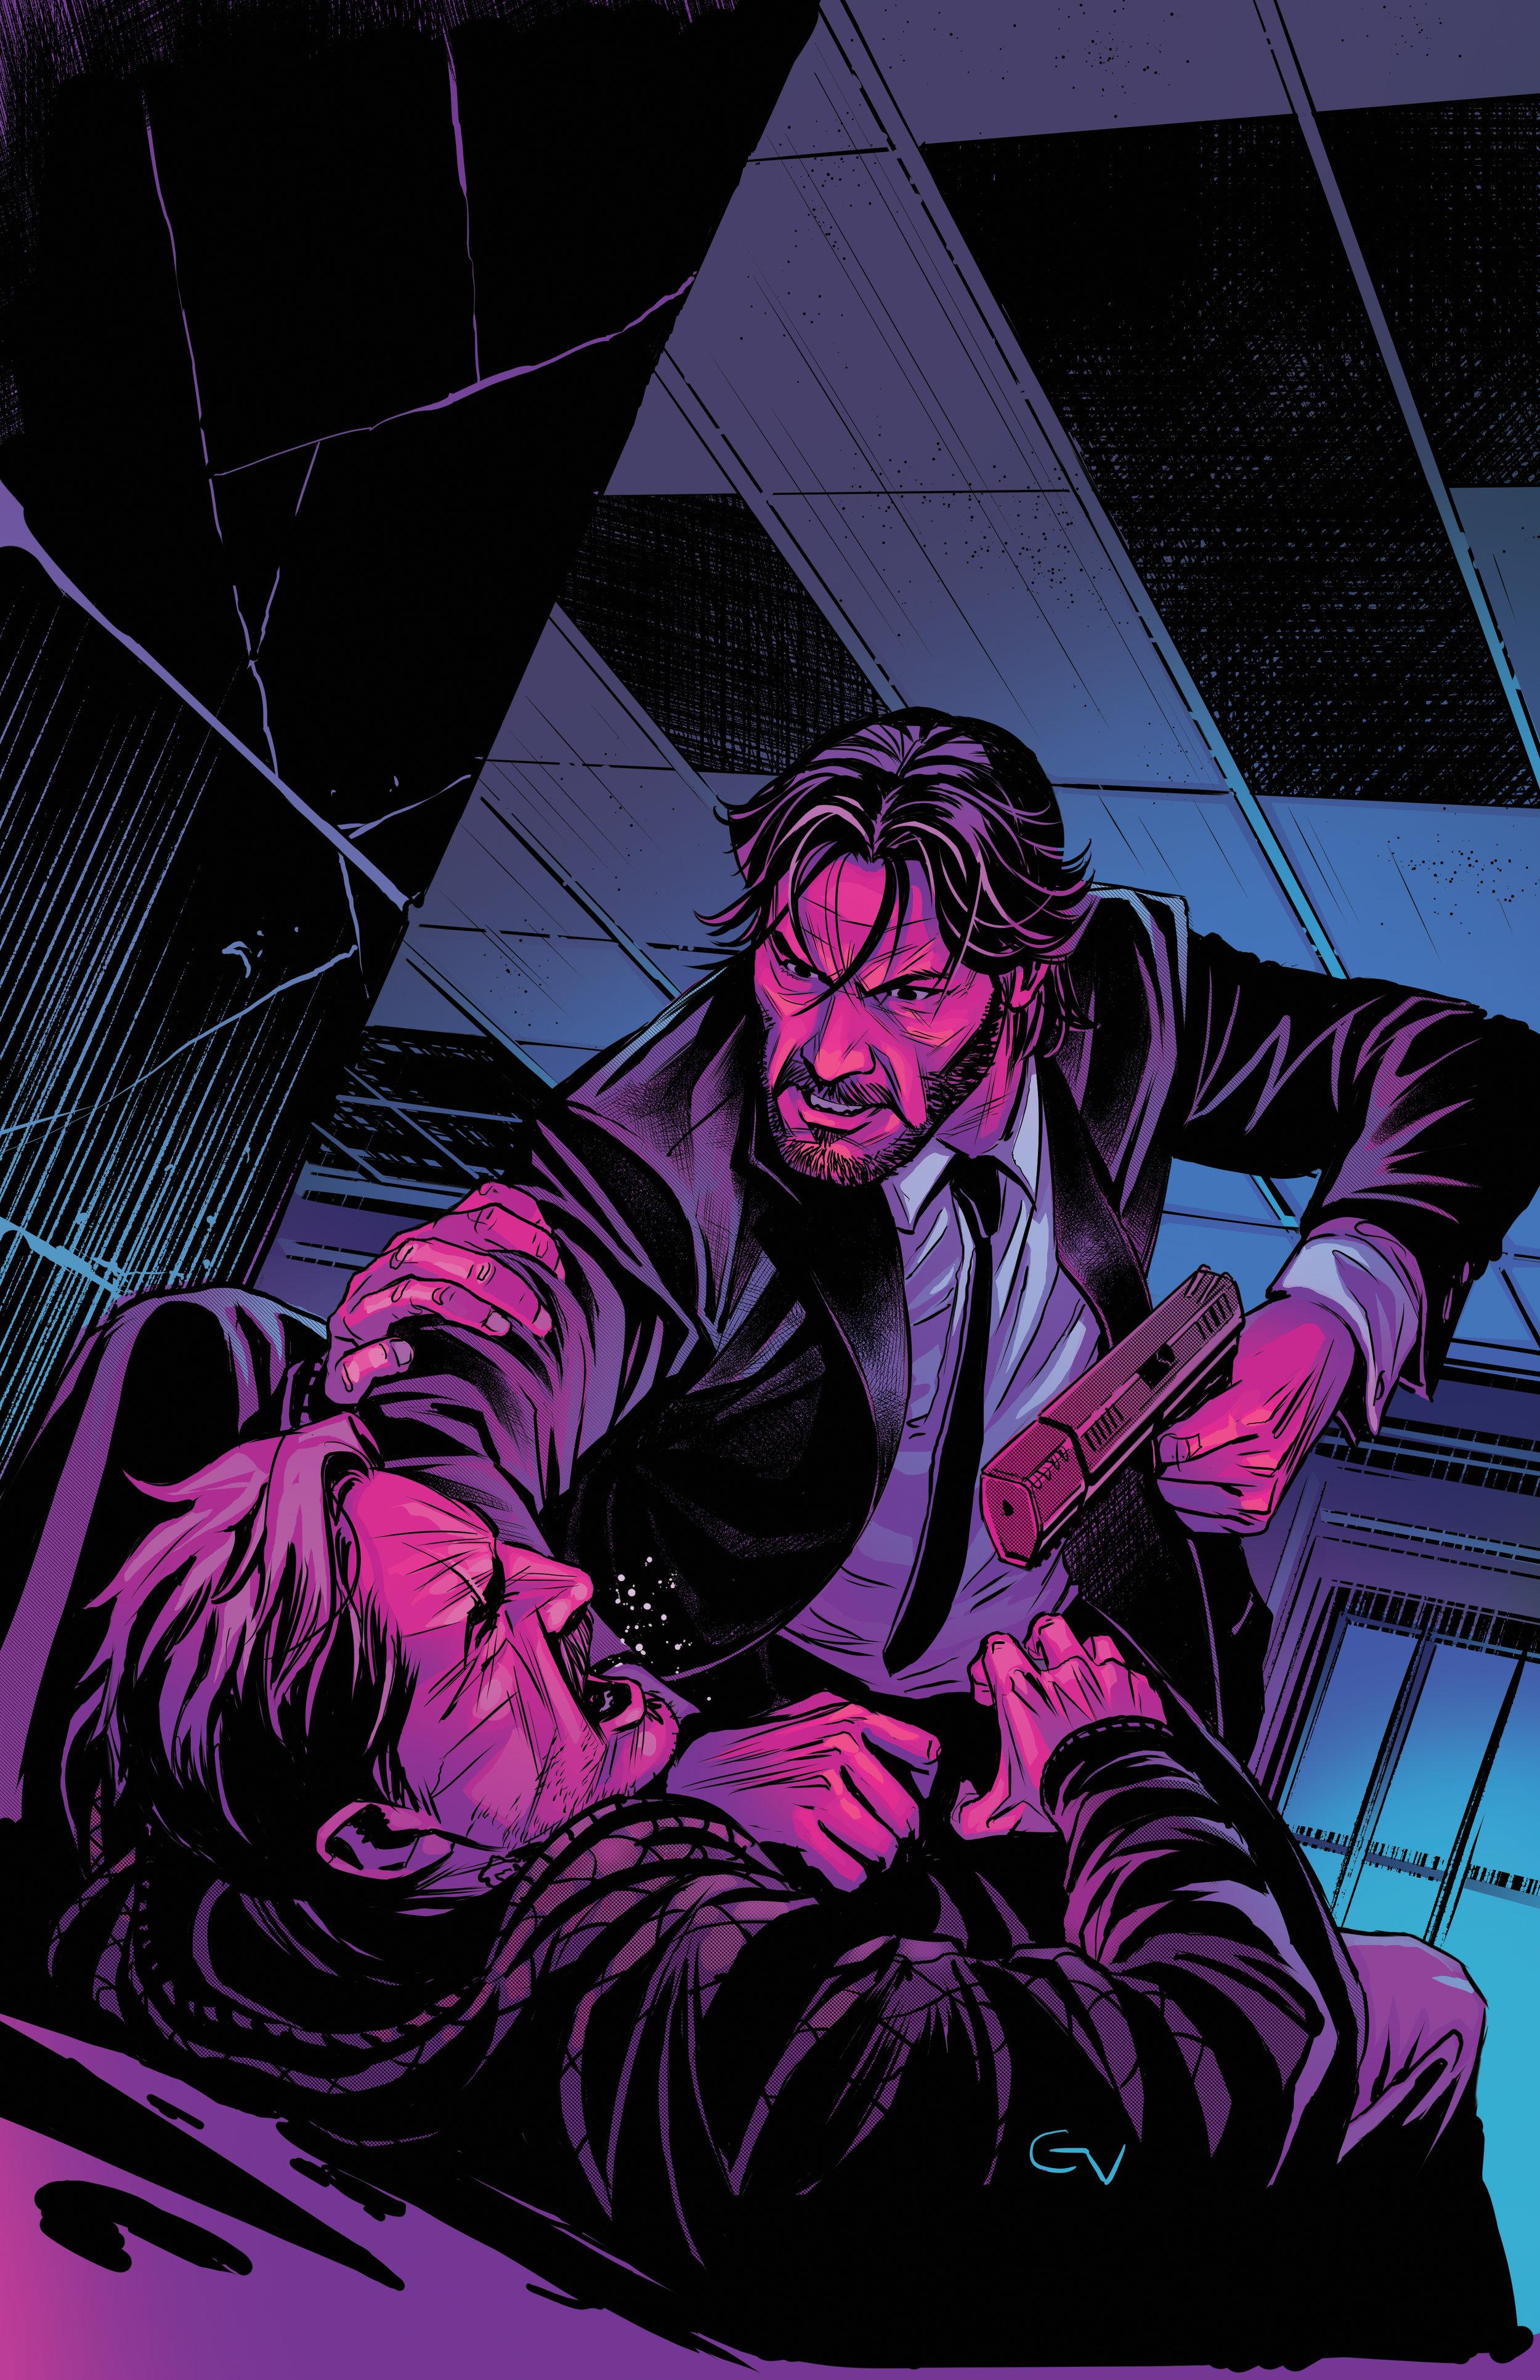 John Wick cover colors.jpg